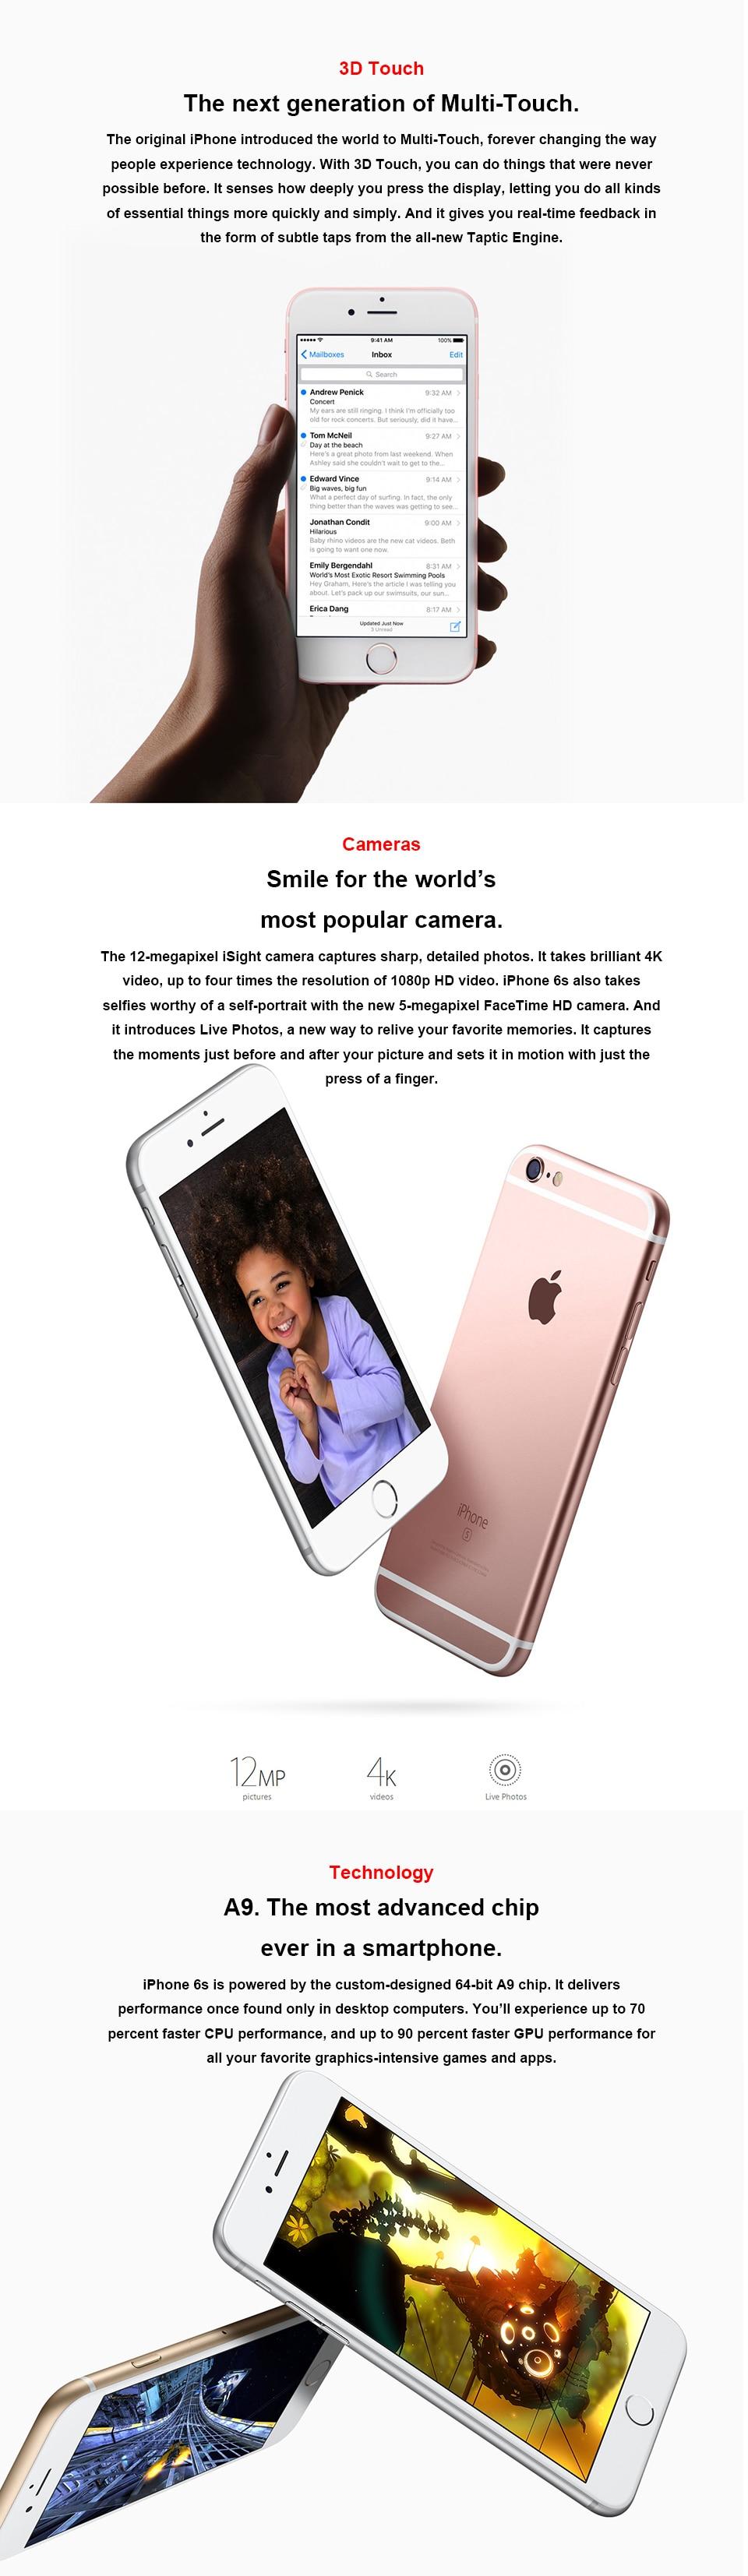 "HTB1UjqRgpooBKNjSZPhq6A2CXXam Original Apple iPhone 6s RAM 2GB 16GB ROM 64GB 128GB 4.7"" iOS Dual Core 12.0MP Camera fingerprint 4G LTE Unlocked Mobile Phone6s"